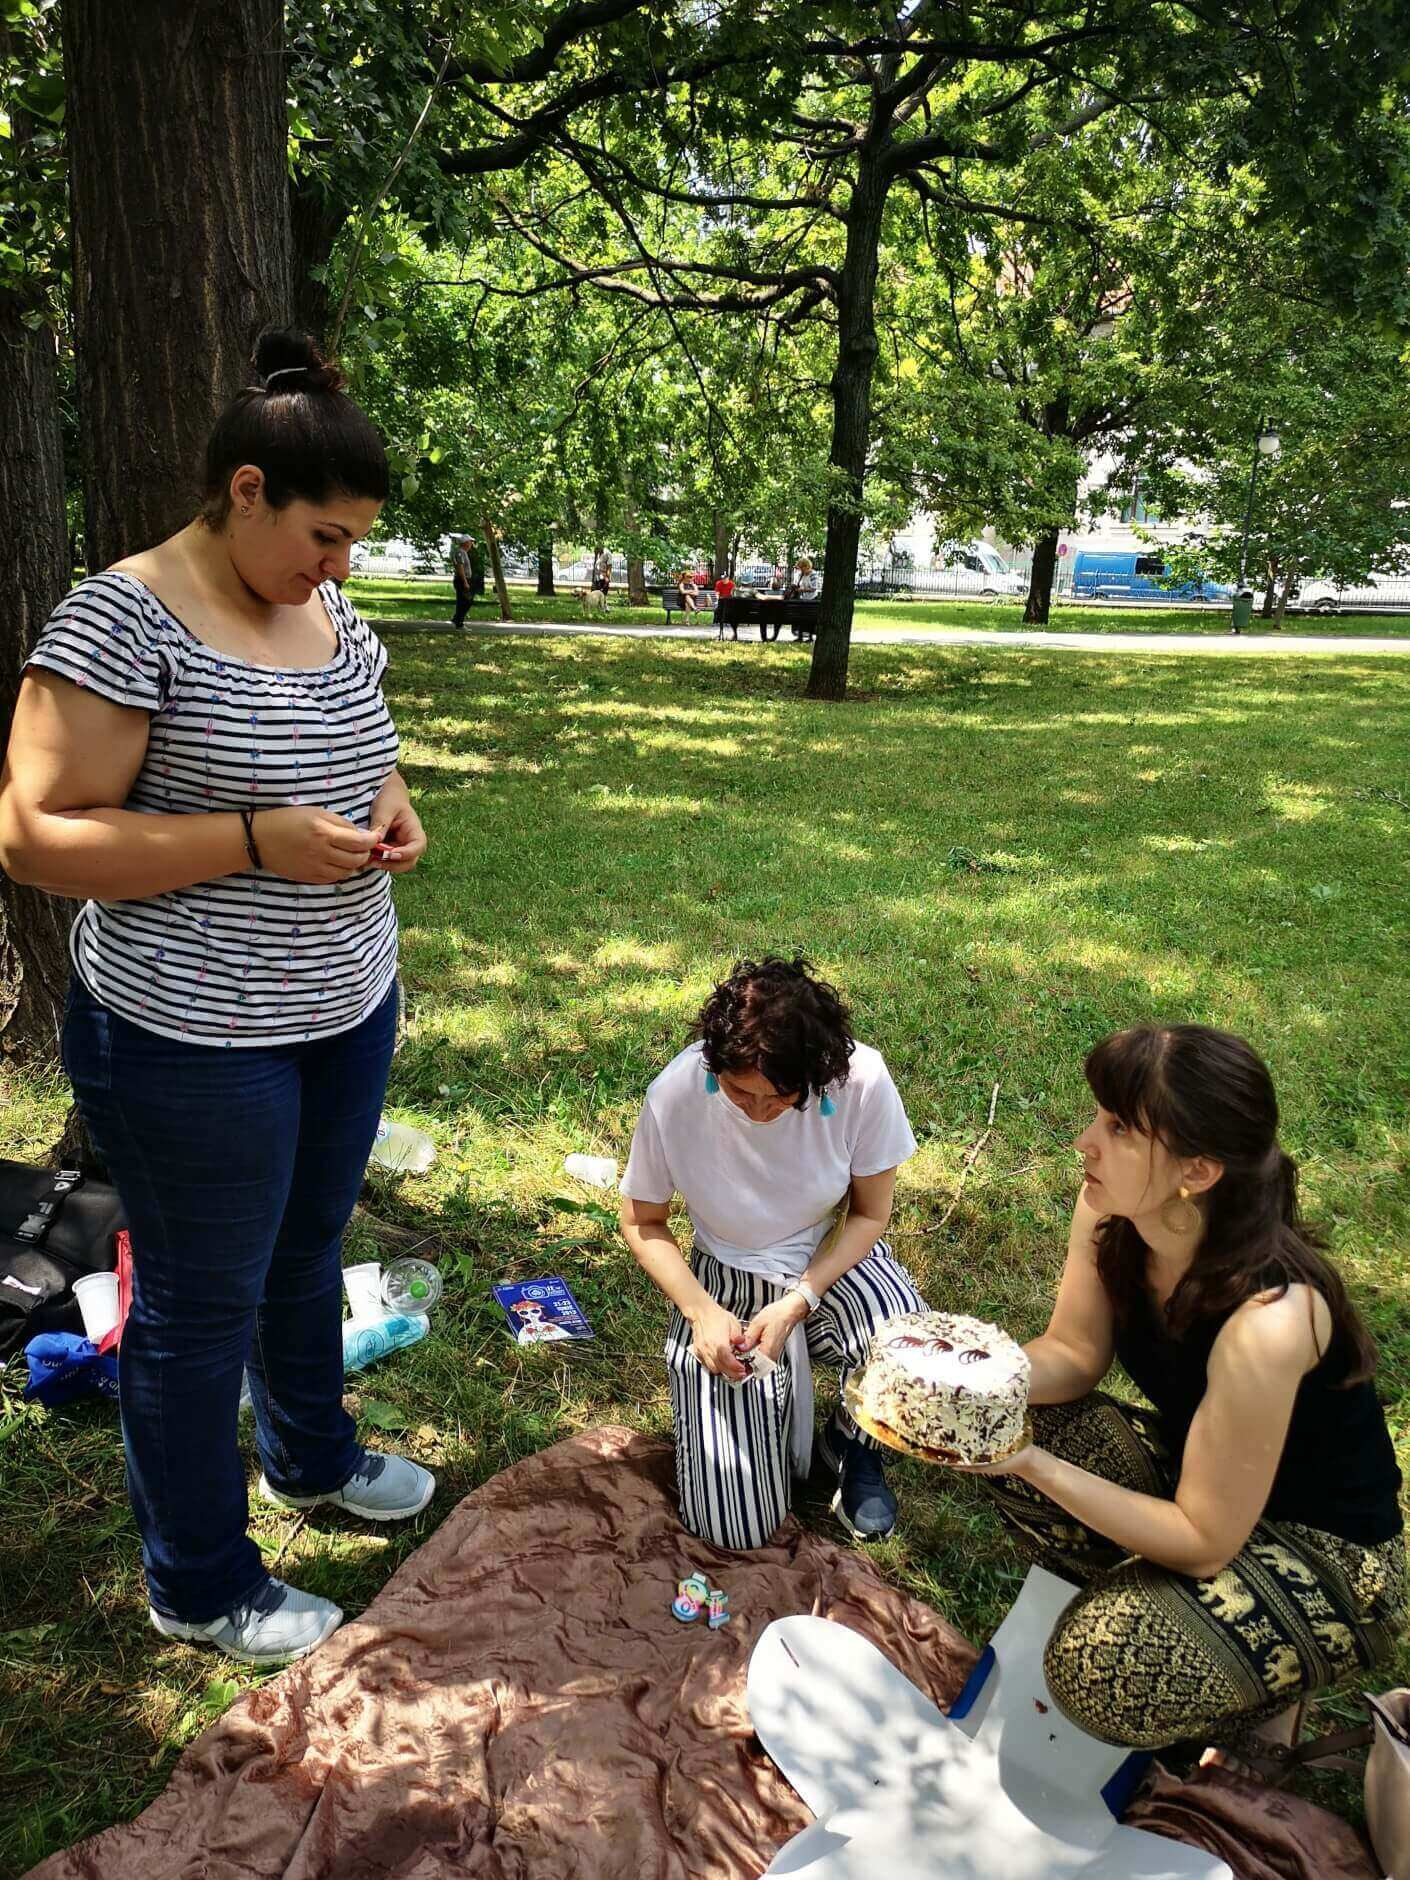 Girls preparing birthday cake at picnic in the park